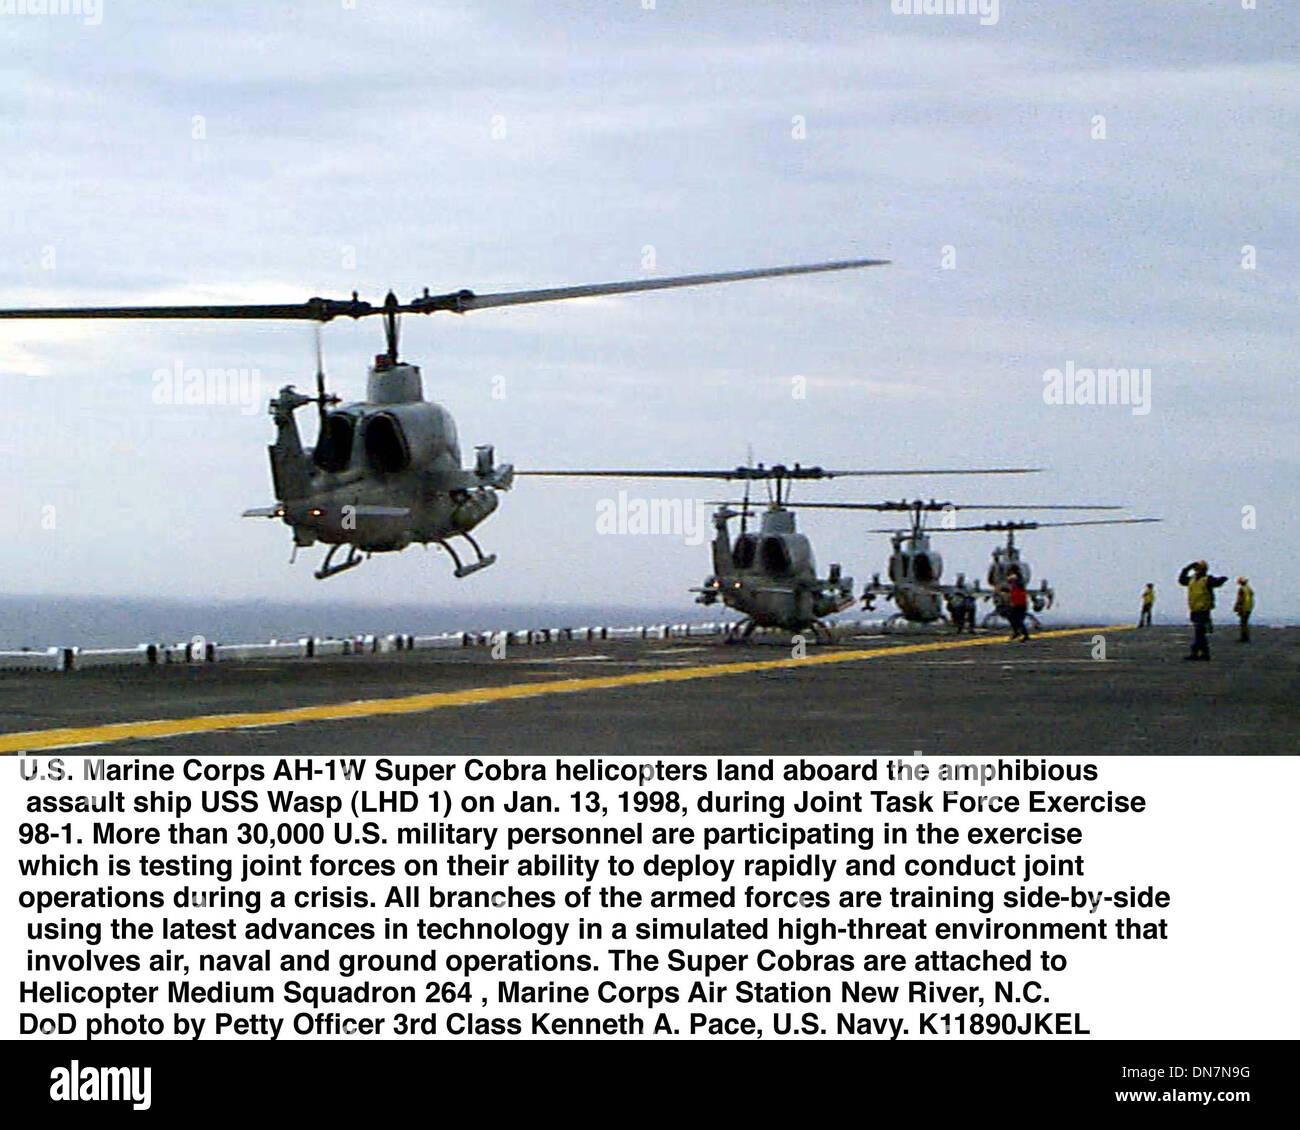 Elicottero 007 : N°007 immagini & n°007 fotos stock alamy